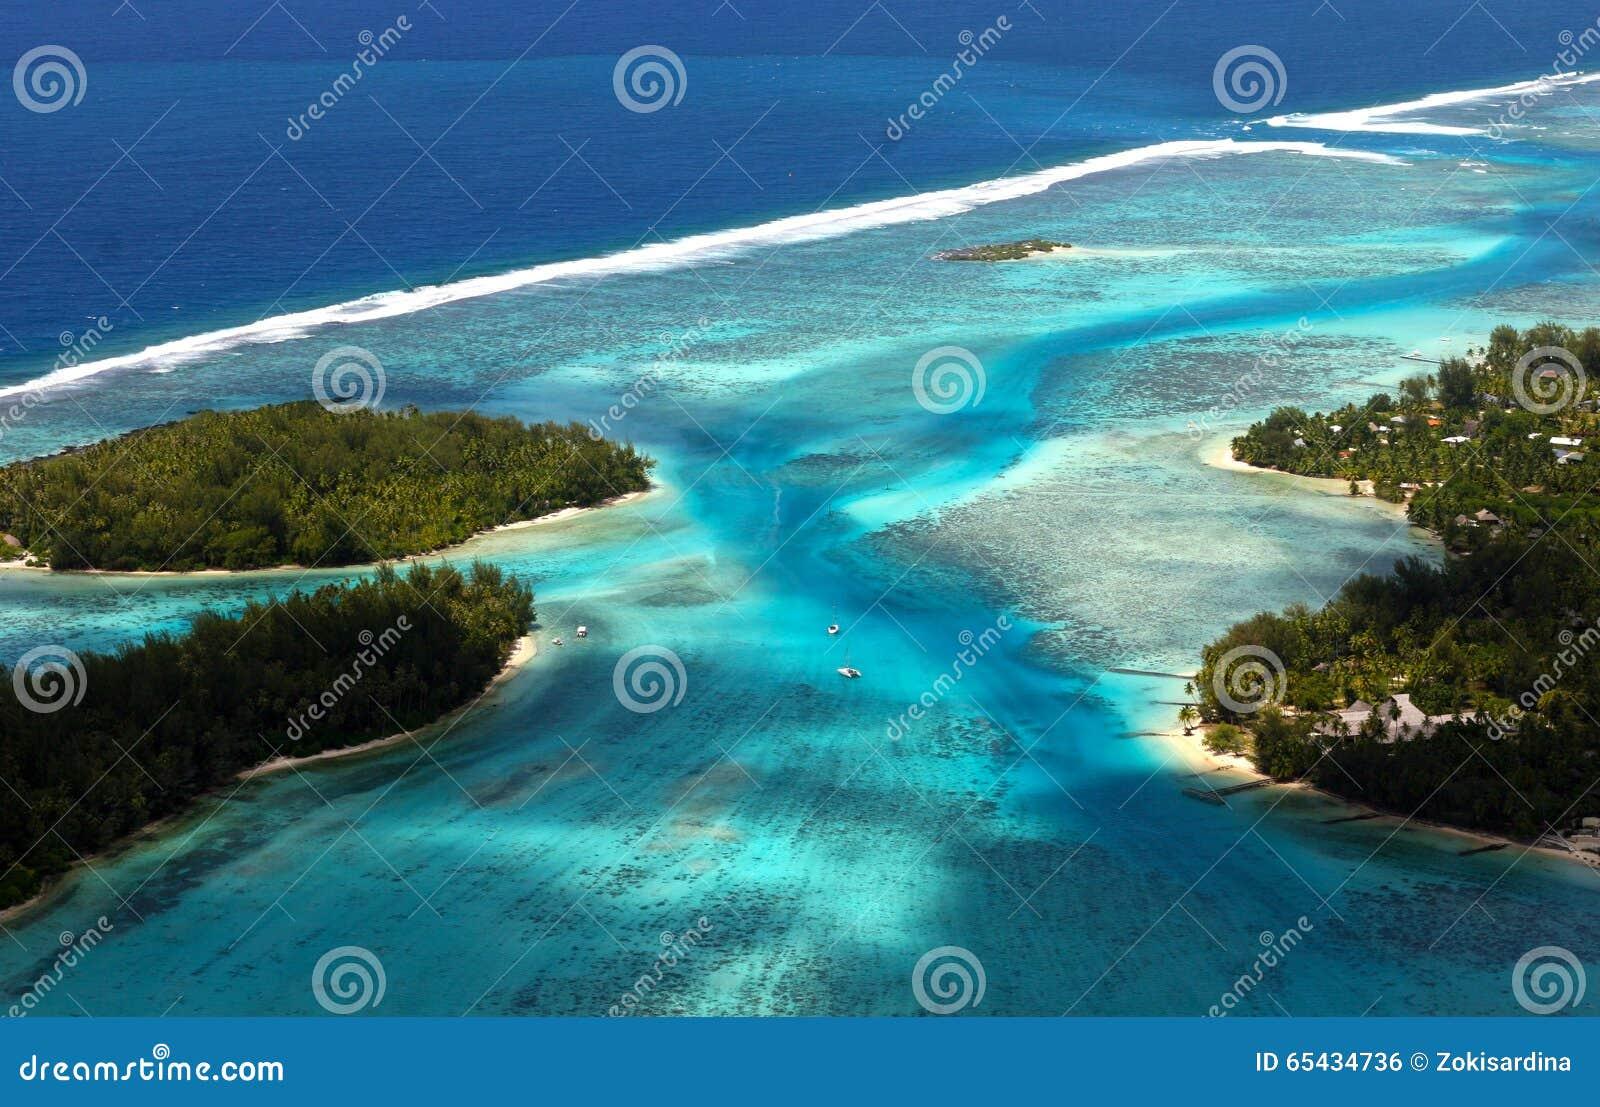 Bora Bora Tahiti Island From Air Stock Photo Image Of